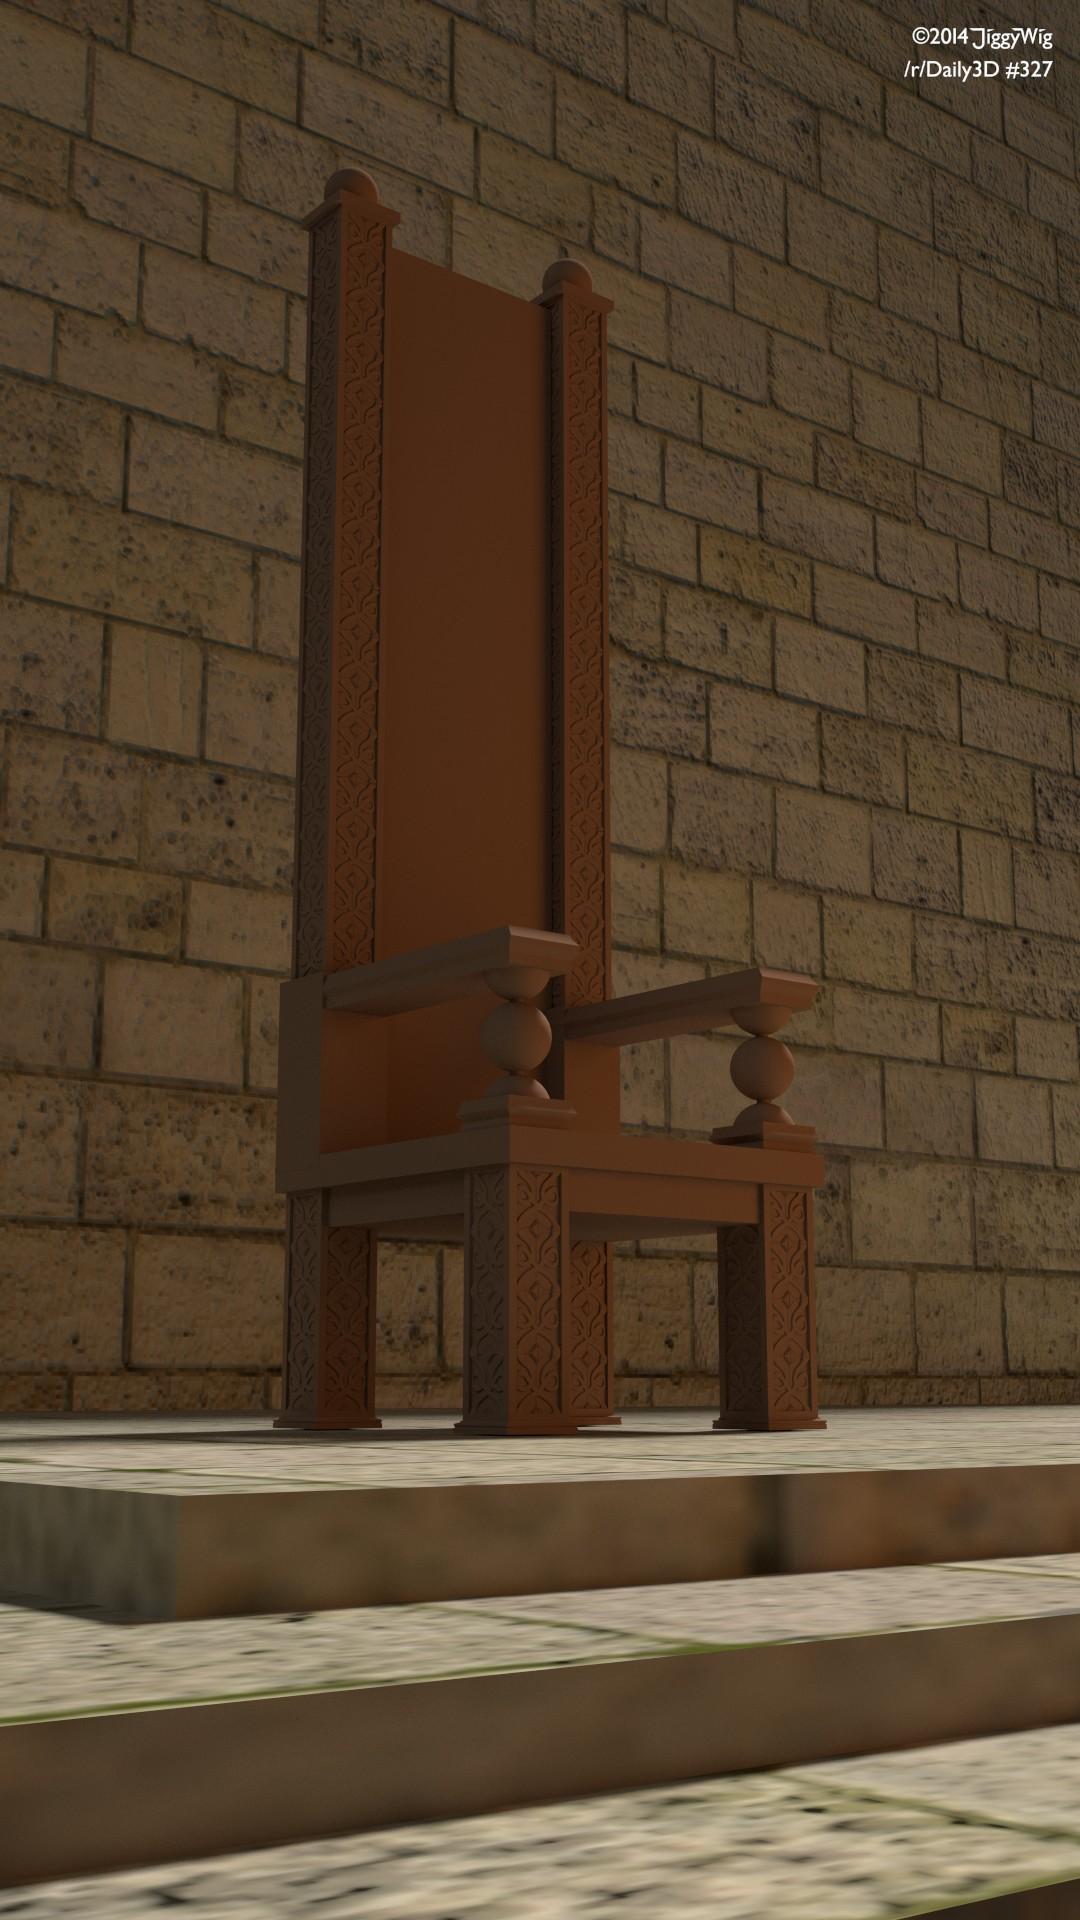 #327 Throne